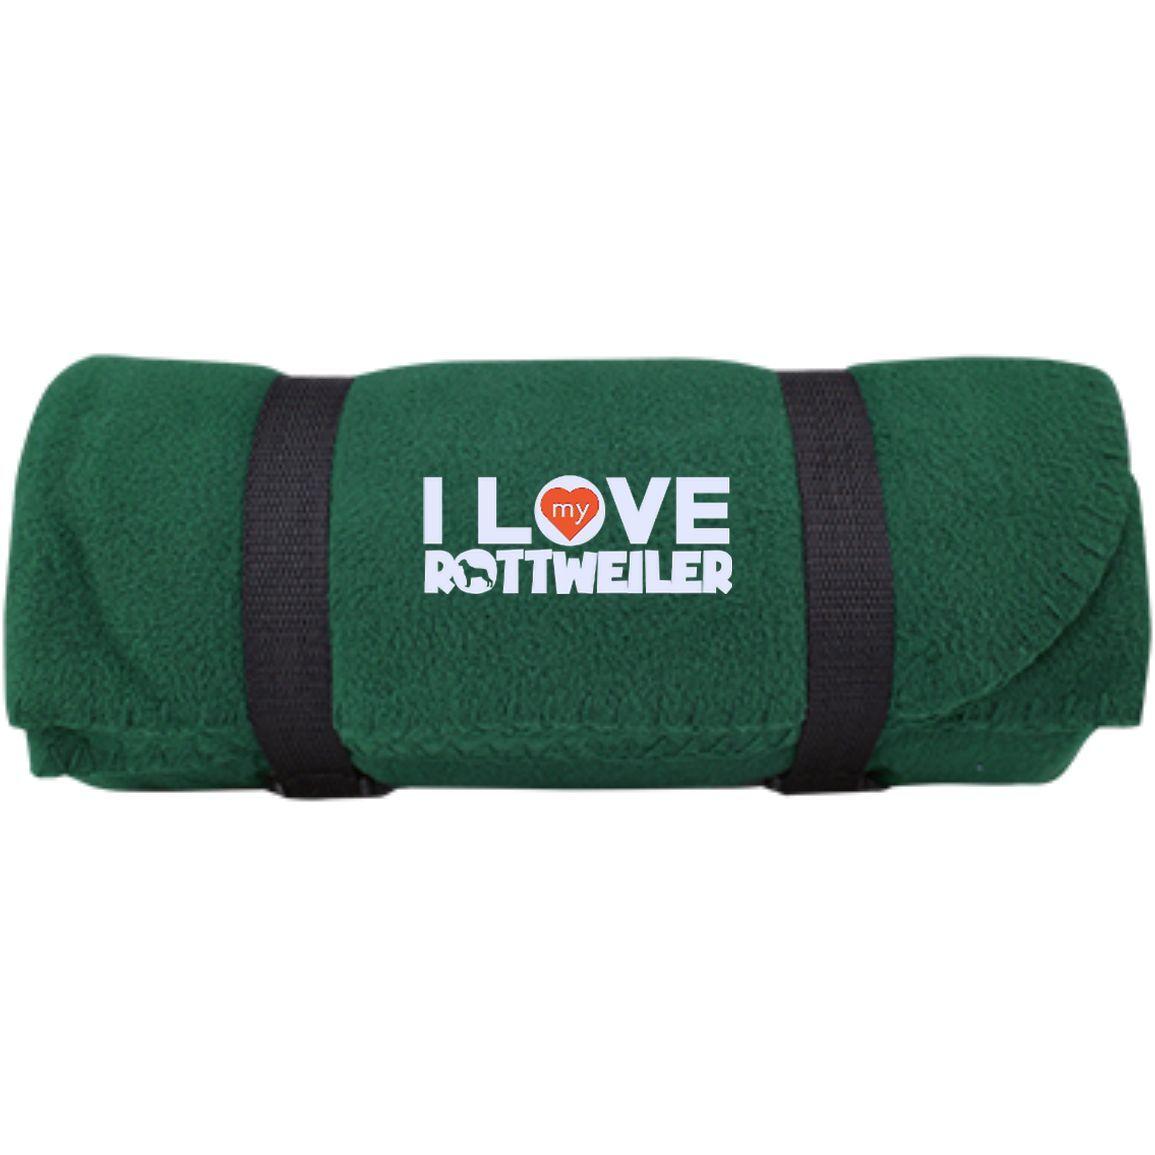 I Love My Rottweiler - Fleece Blanket (Embroidered)